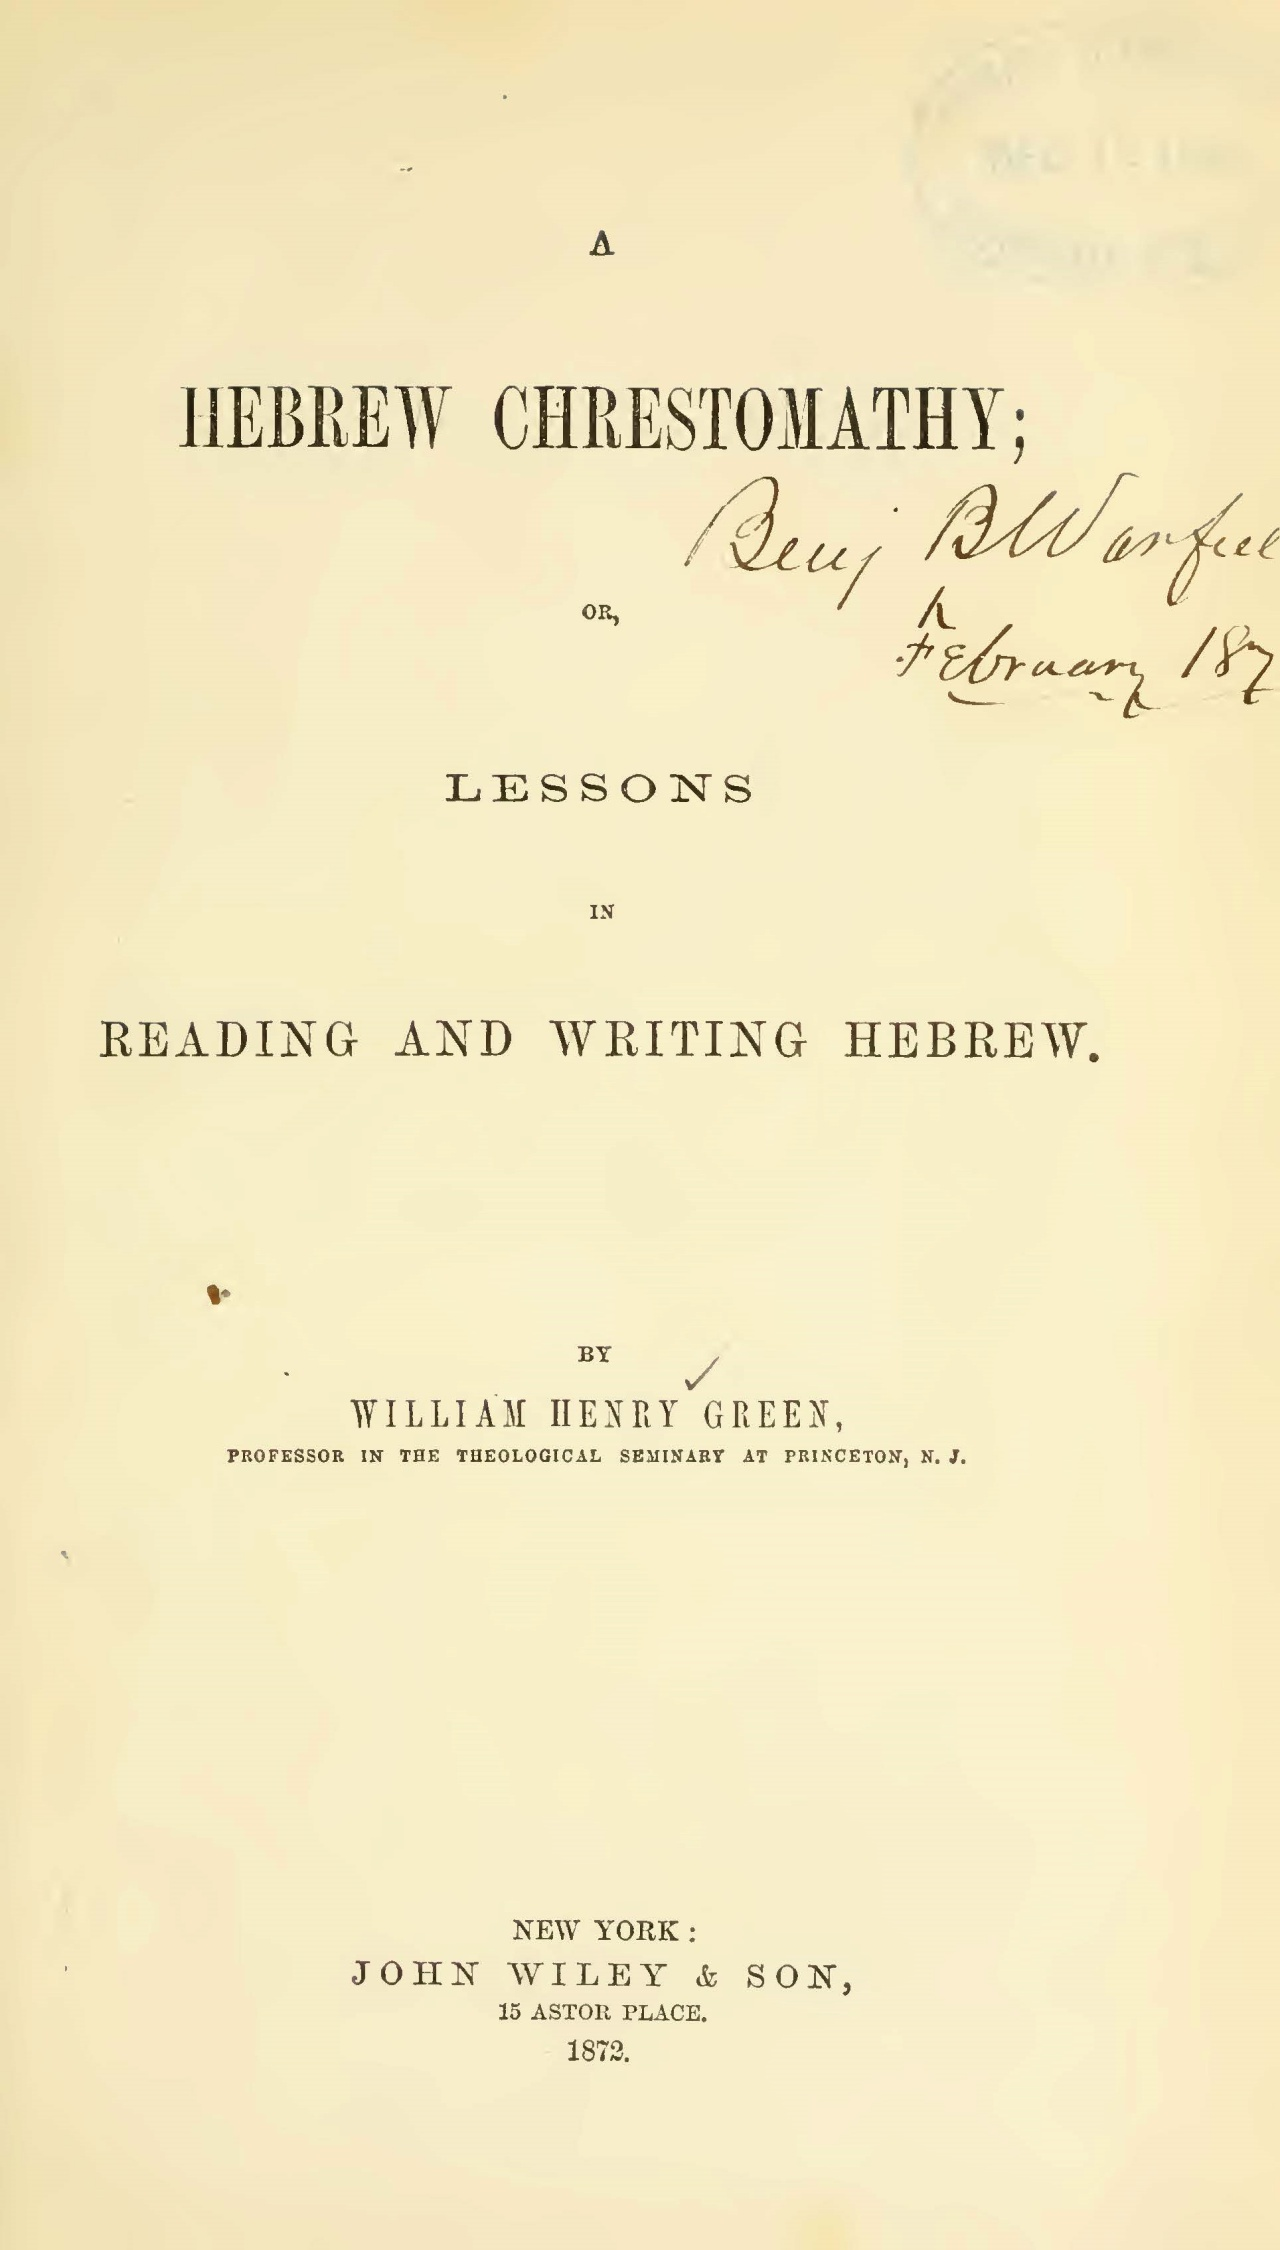 Green, William Henry, A Hebrew Chrestomathy Title Page.jpg